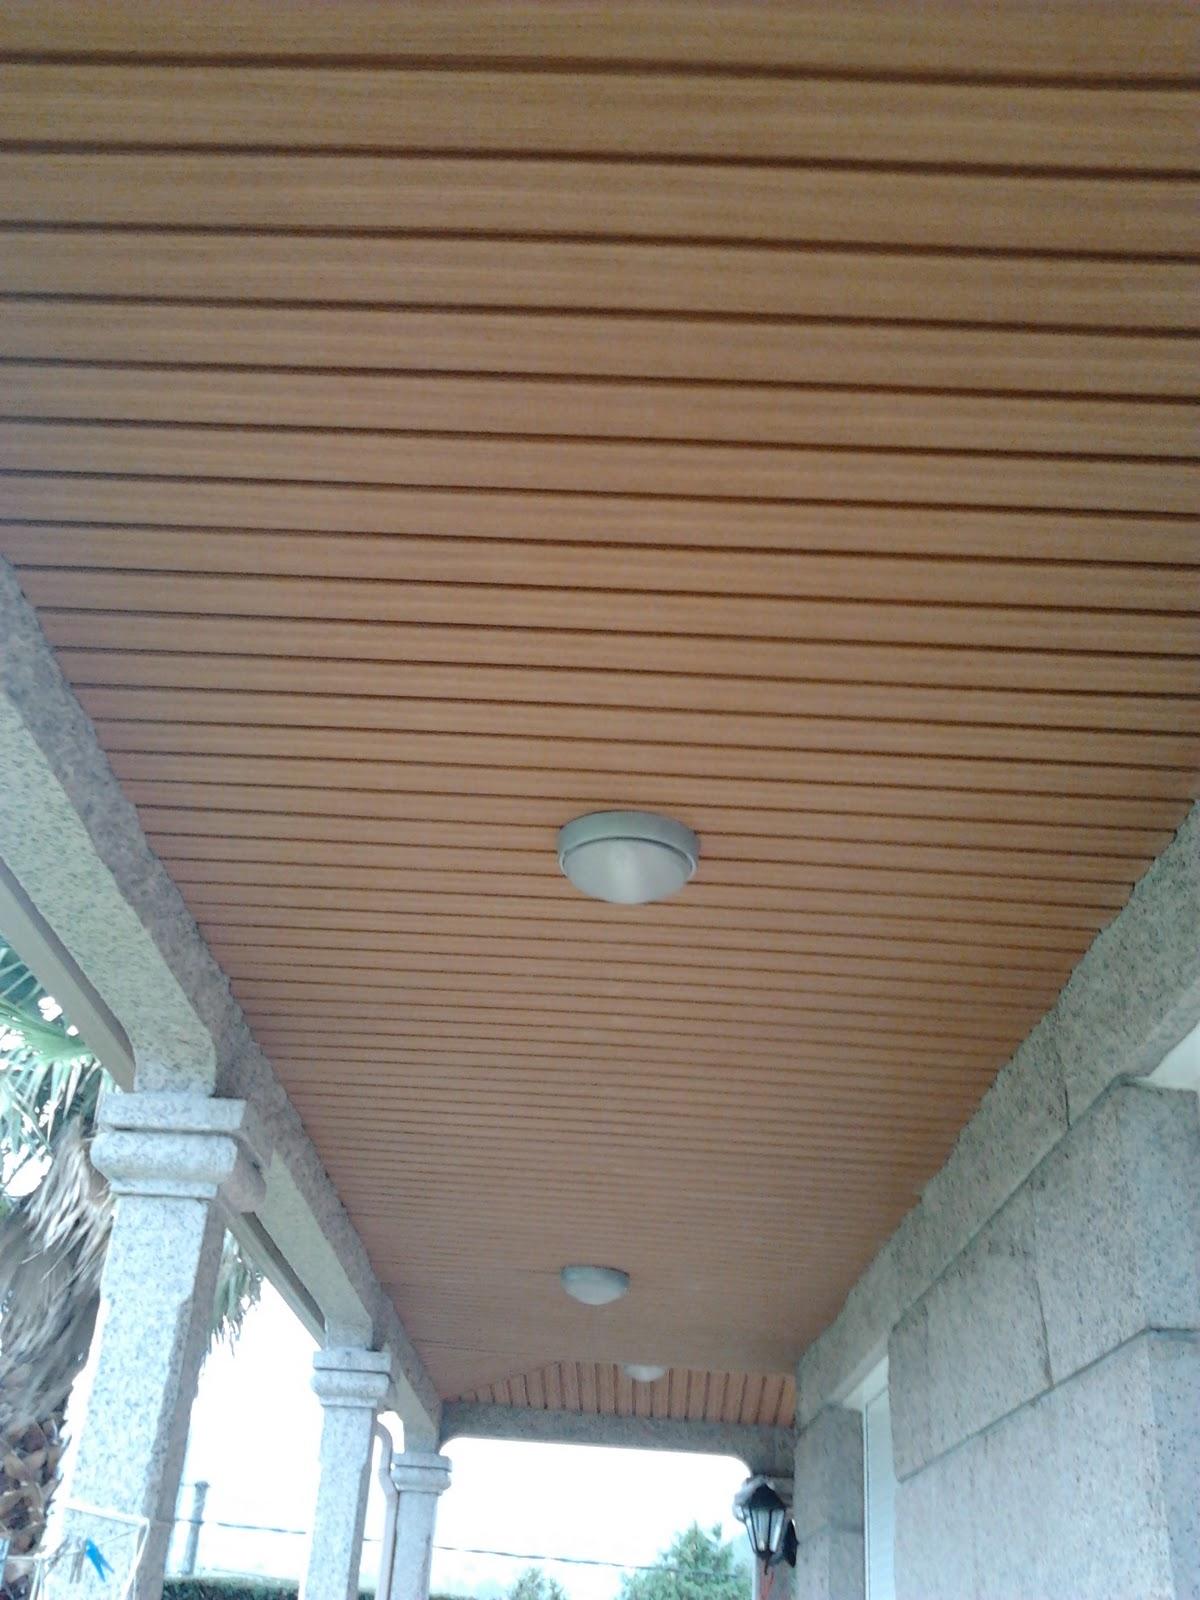 Forrar techos con madera - Falsos techos pvc ...